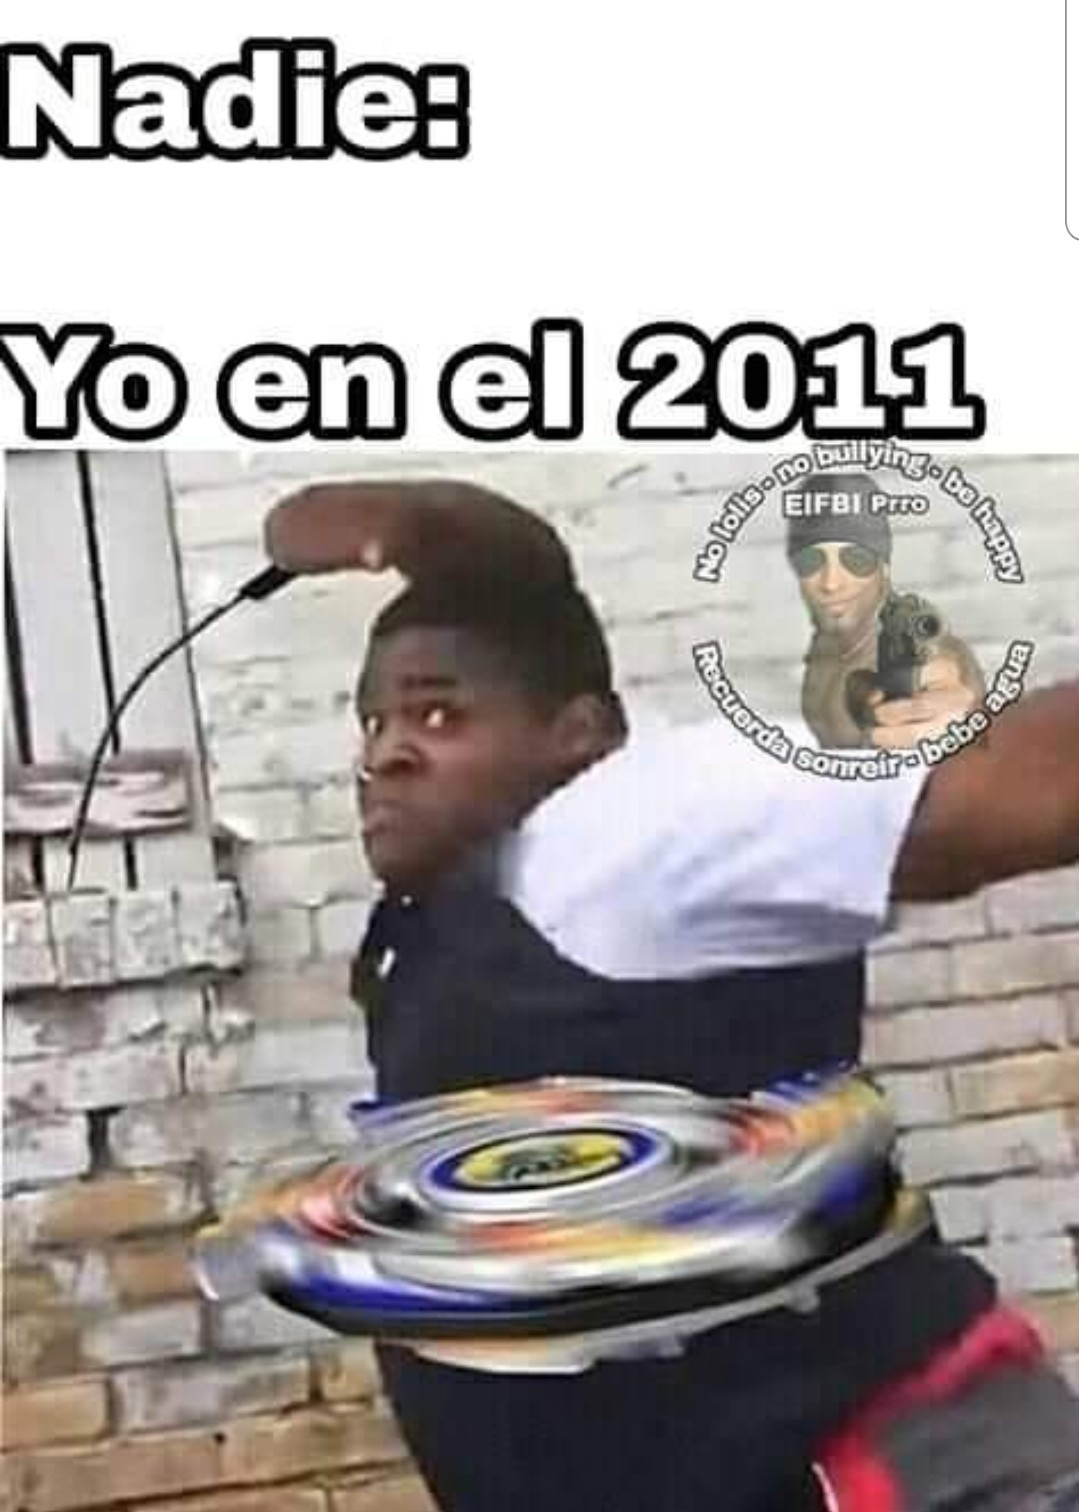 2011 - meme